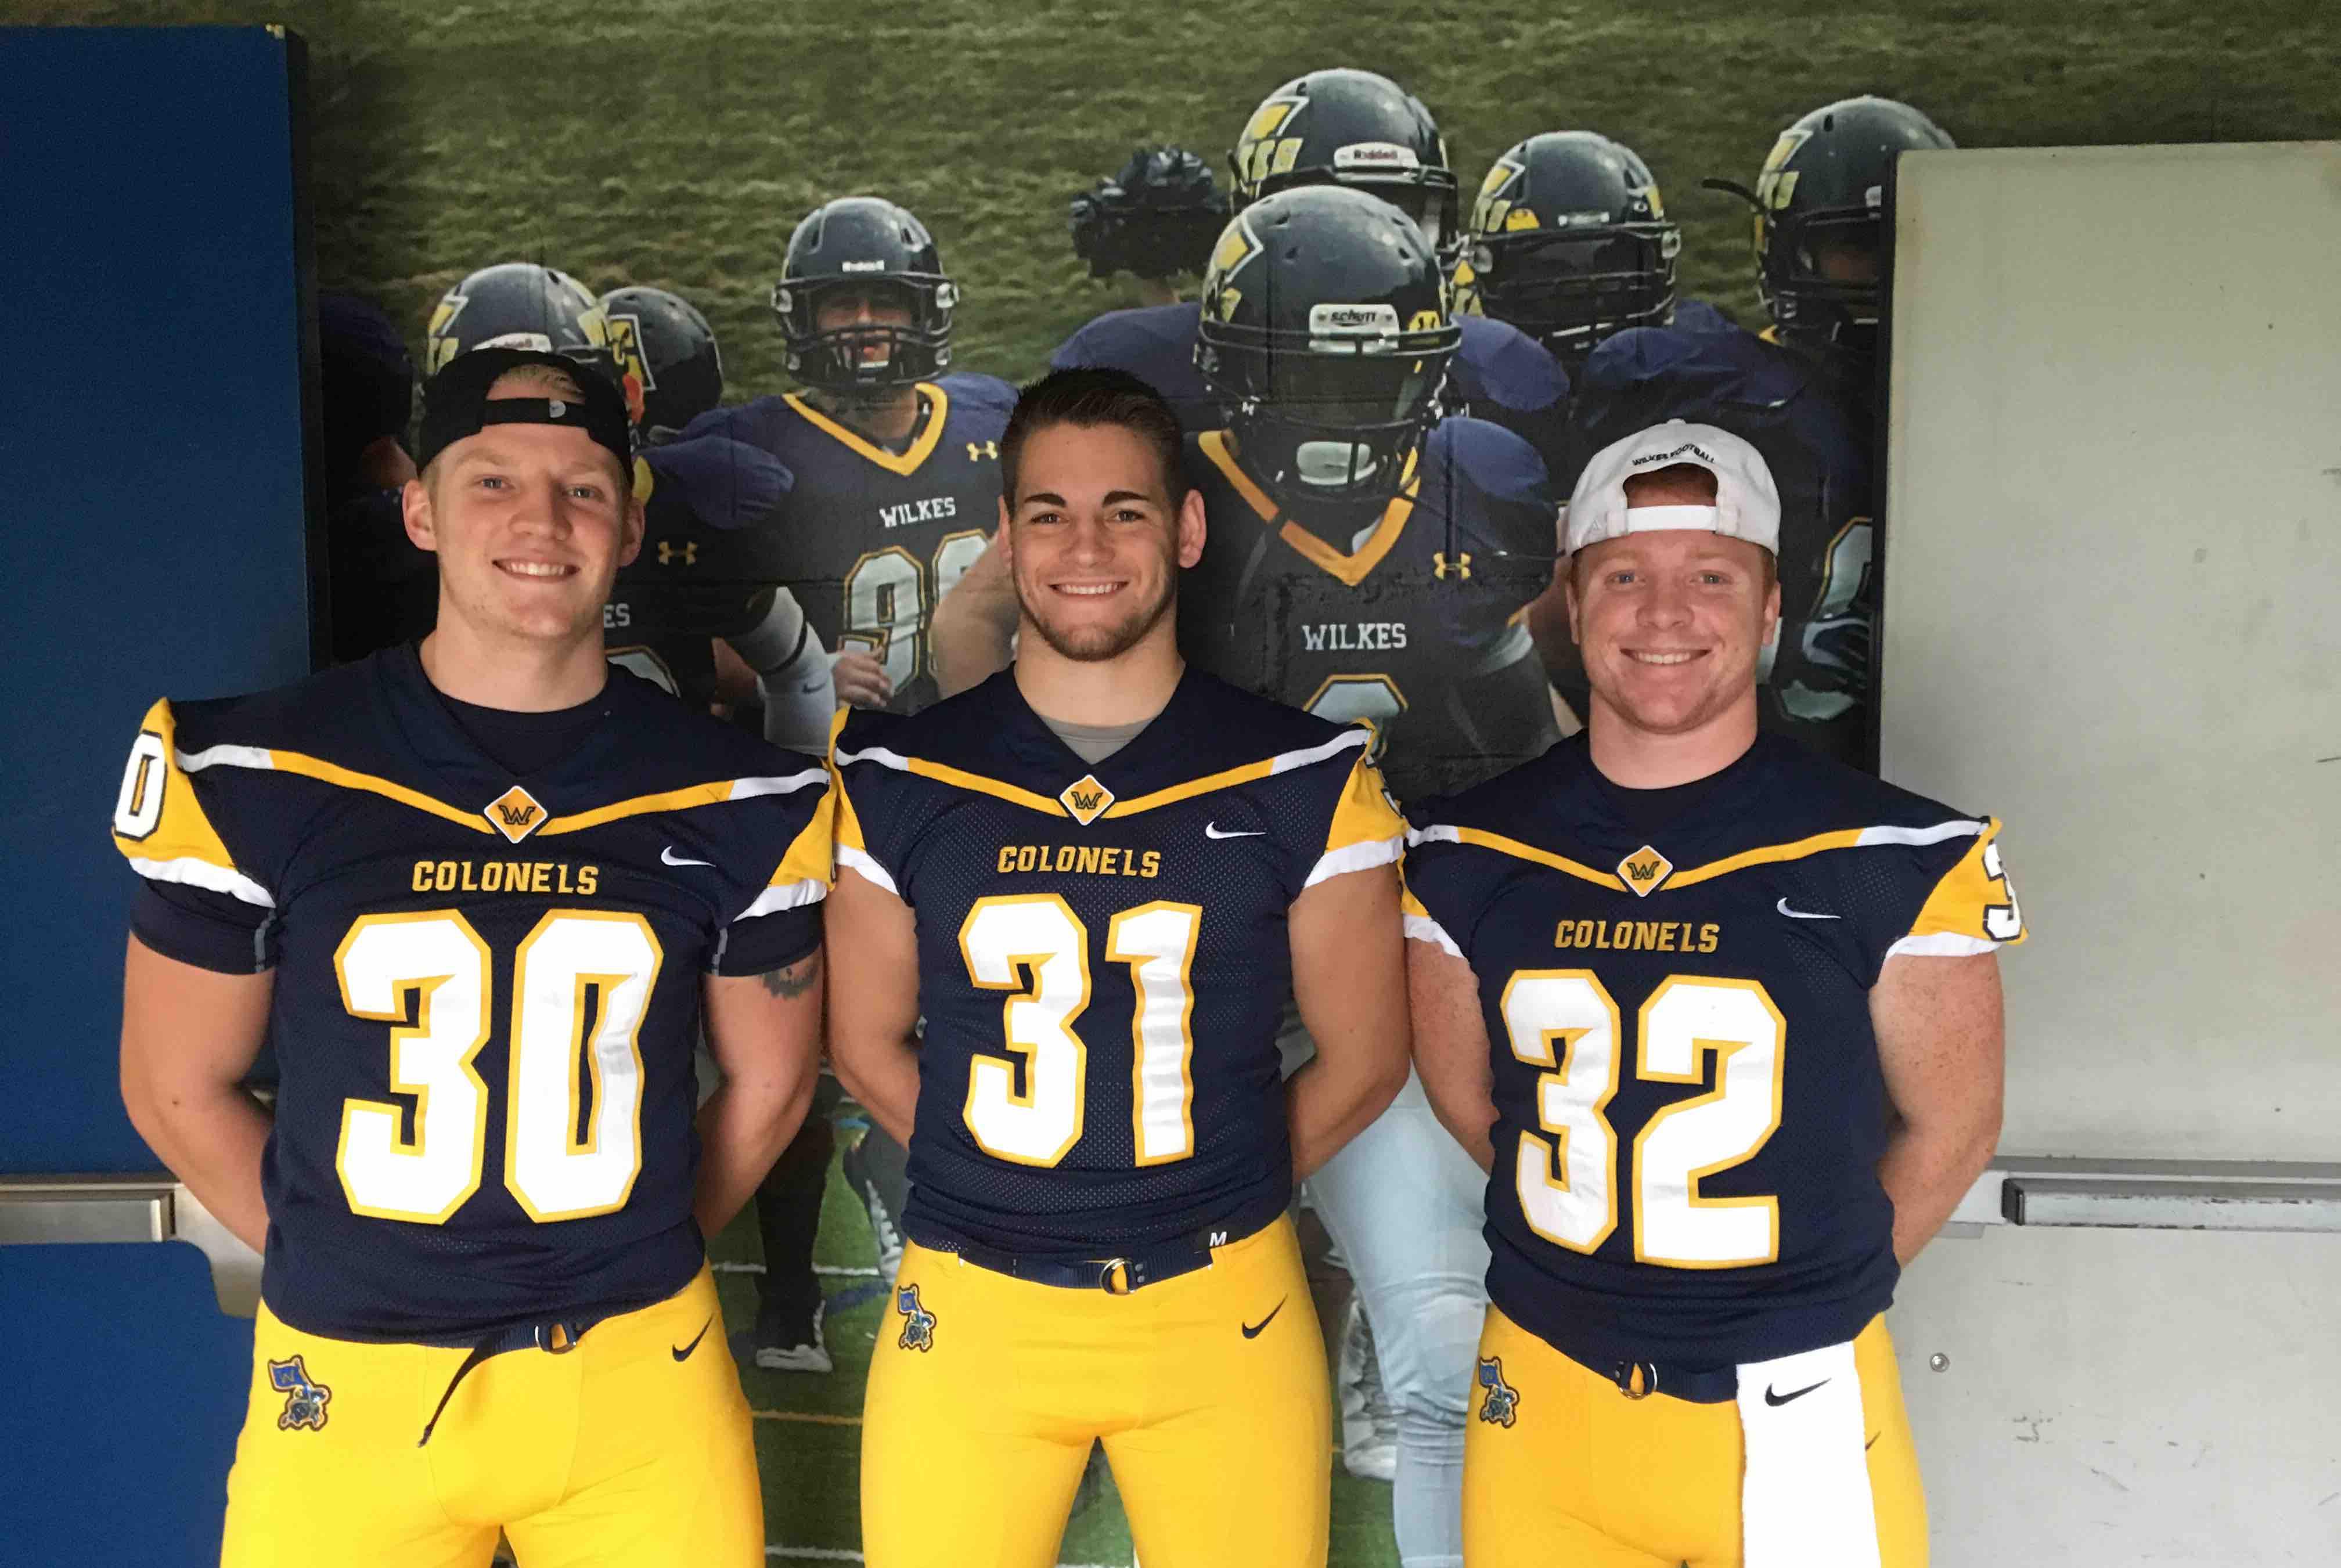 Wilkes University Cheerleading